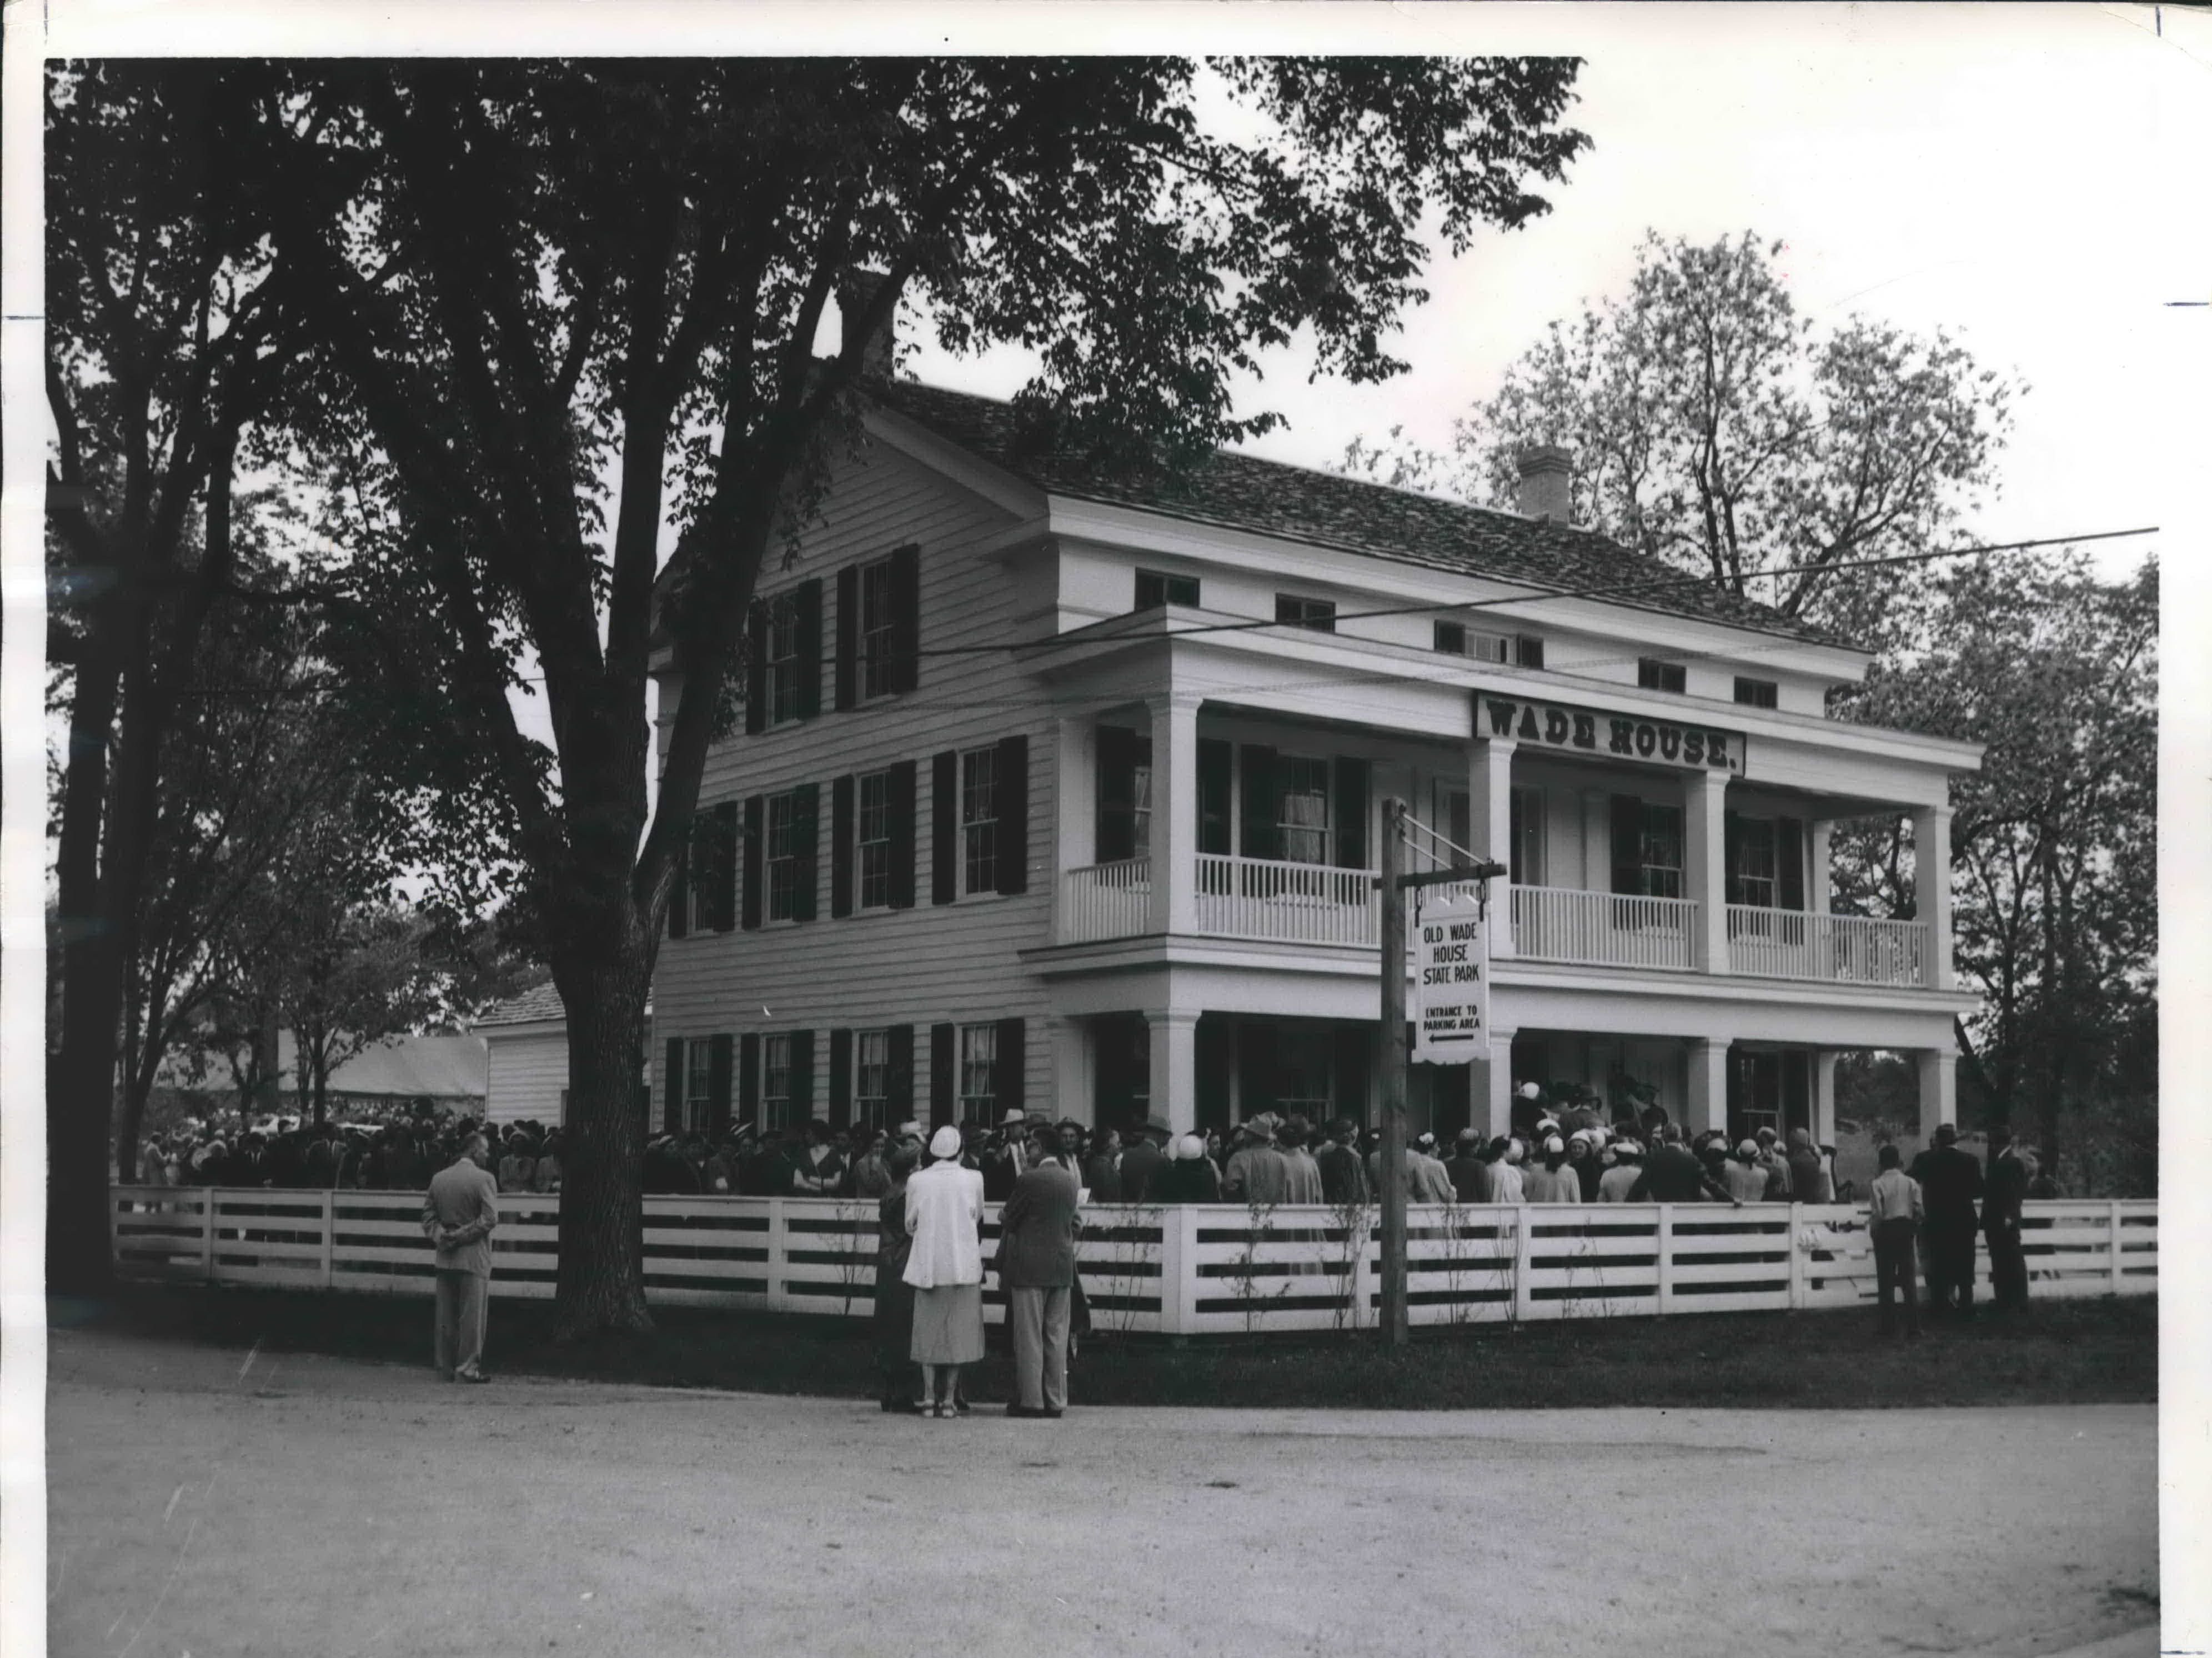 1953: Carl Sandburg spoke on Dedication Day at Old Wade House in Greenbush, Wisconsin.